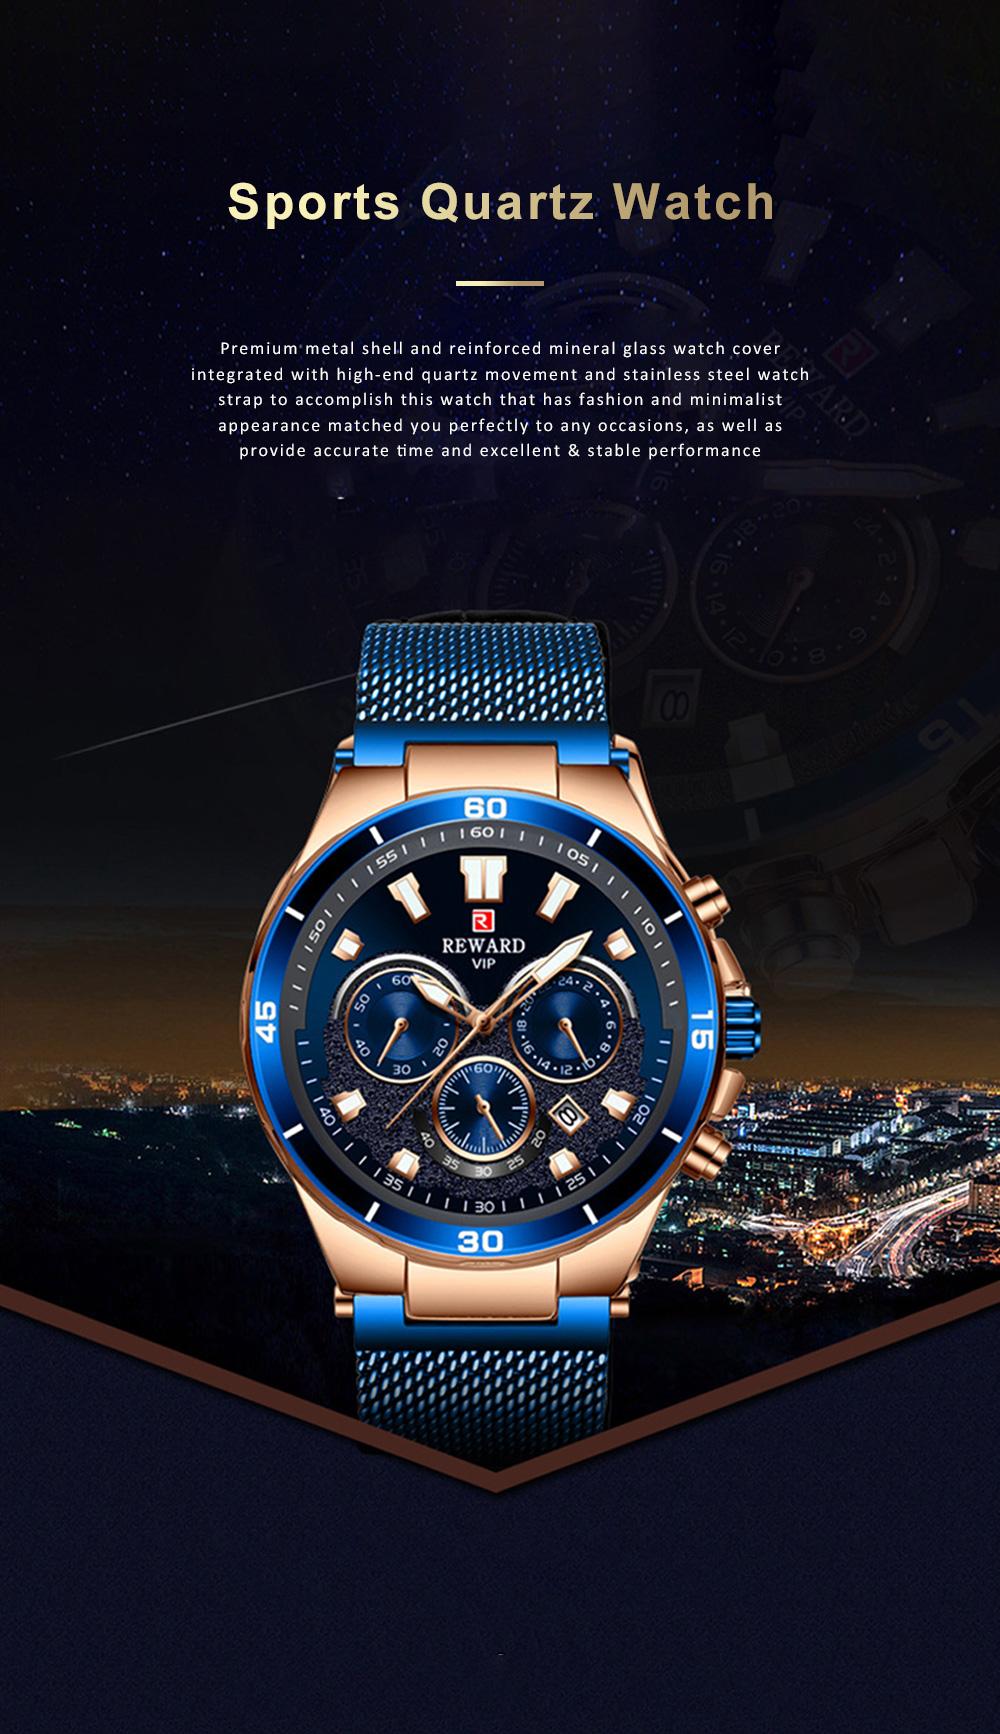 3 Dials Sports Quartz Watch with Adjustable Stainless Steel Watchband, Waterproof Fashion Accessories Wrist Watch for Men 0